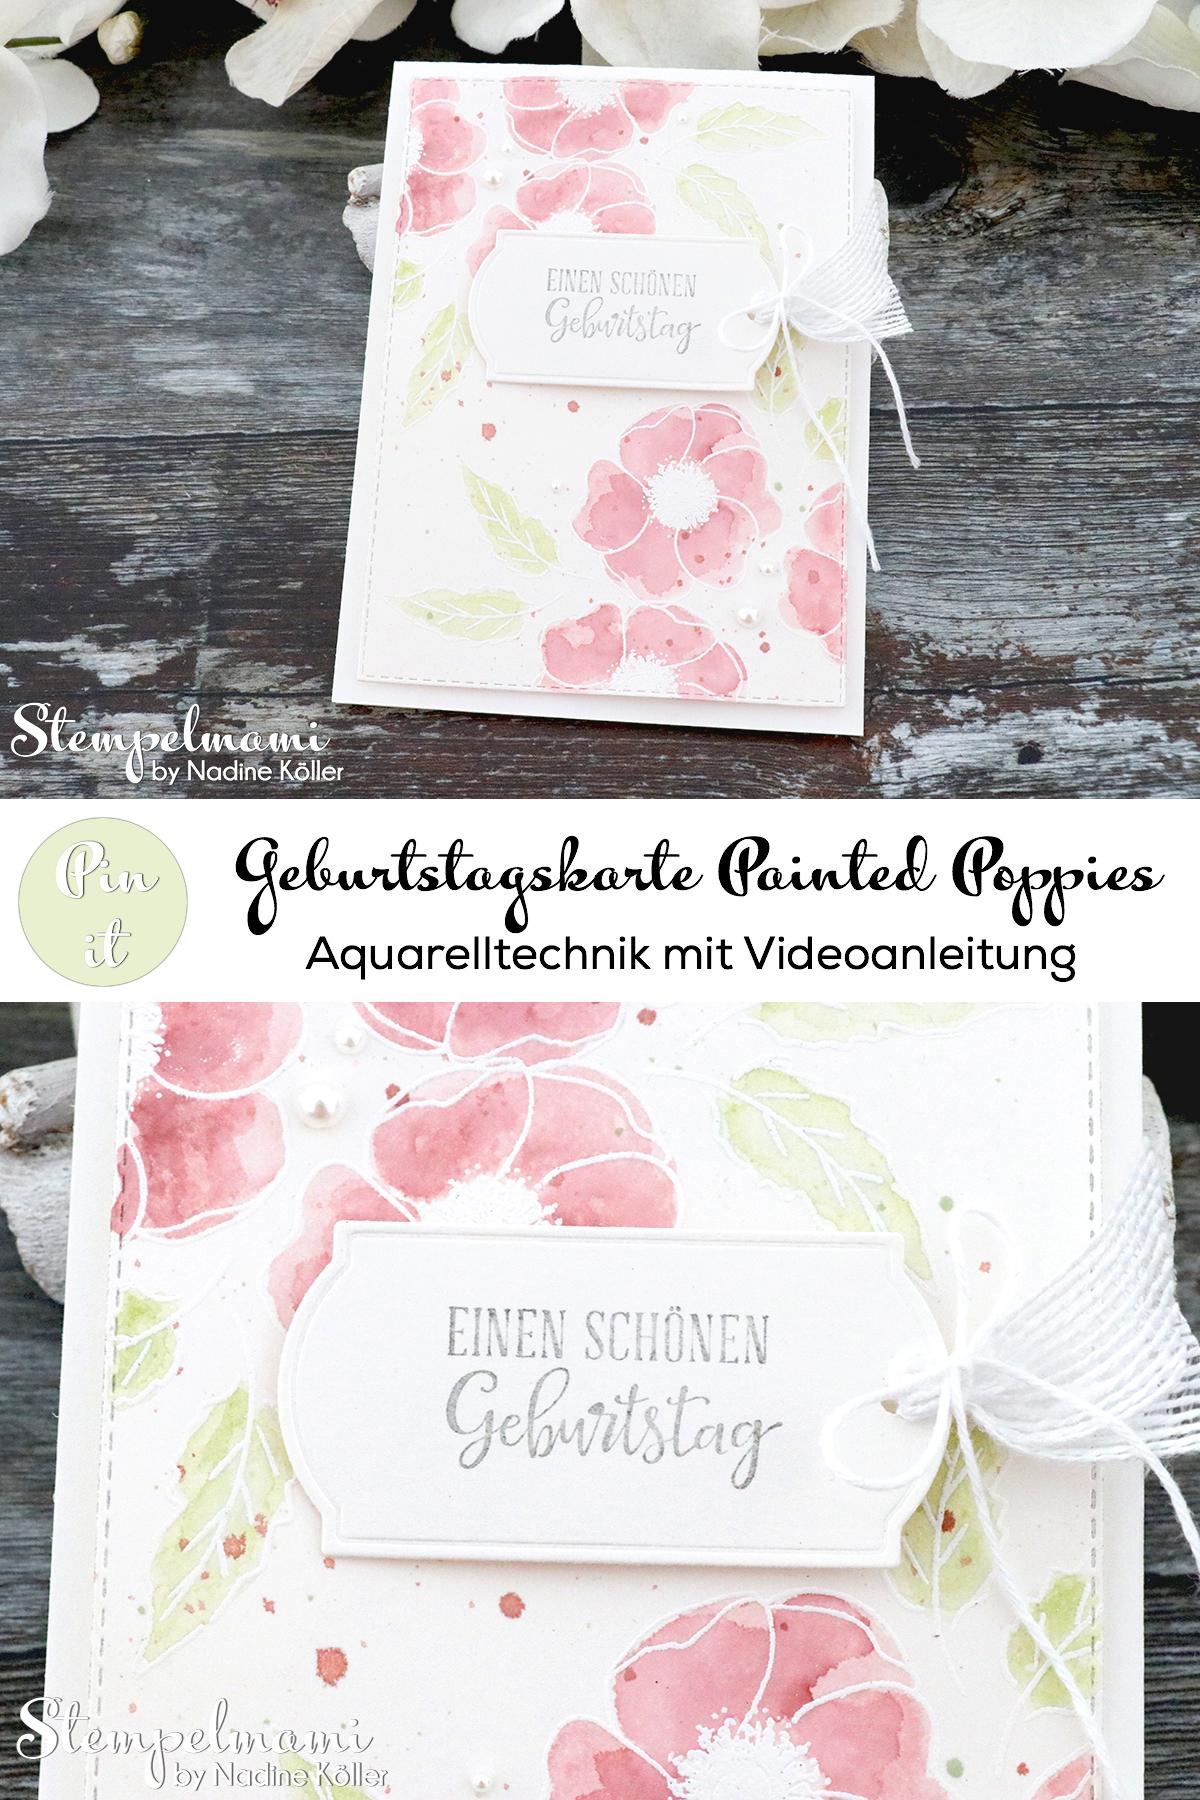 Stampin Up Geburtstagskarte Painted Poppies in Aquarelltechnik mit Videoanleitung Mohnbluetenzauber Stempelmami 5